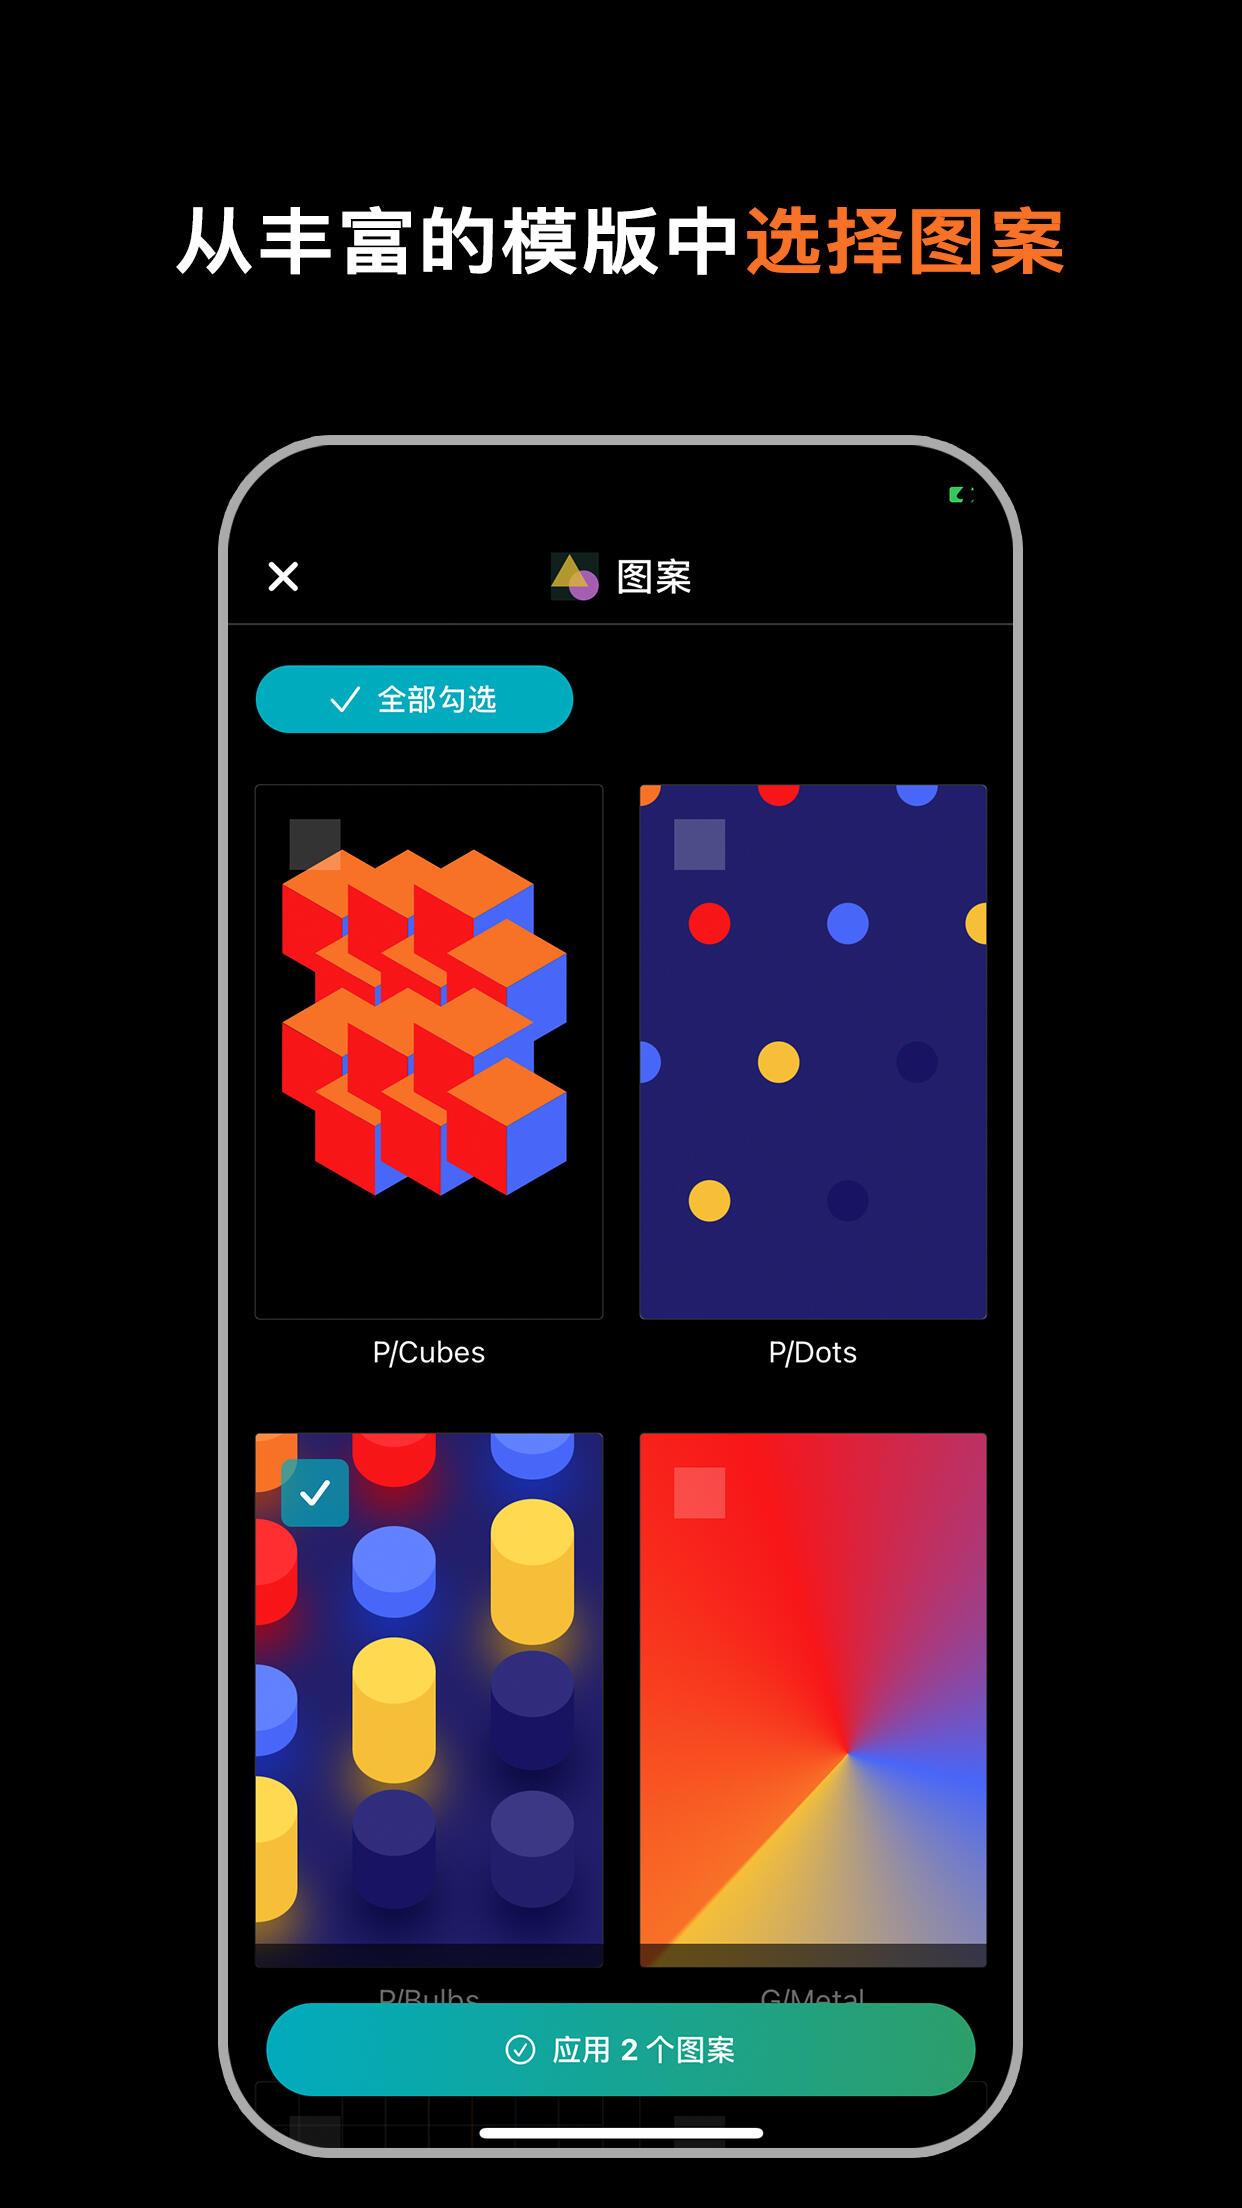 Light 壁纸 - 由代码生成的无限数量壁纸应用[iPhone/iPad] 2